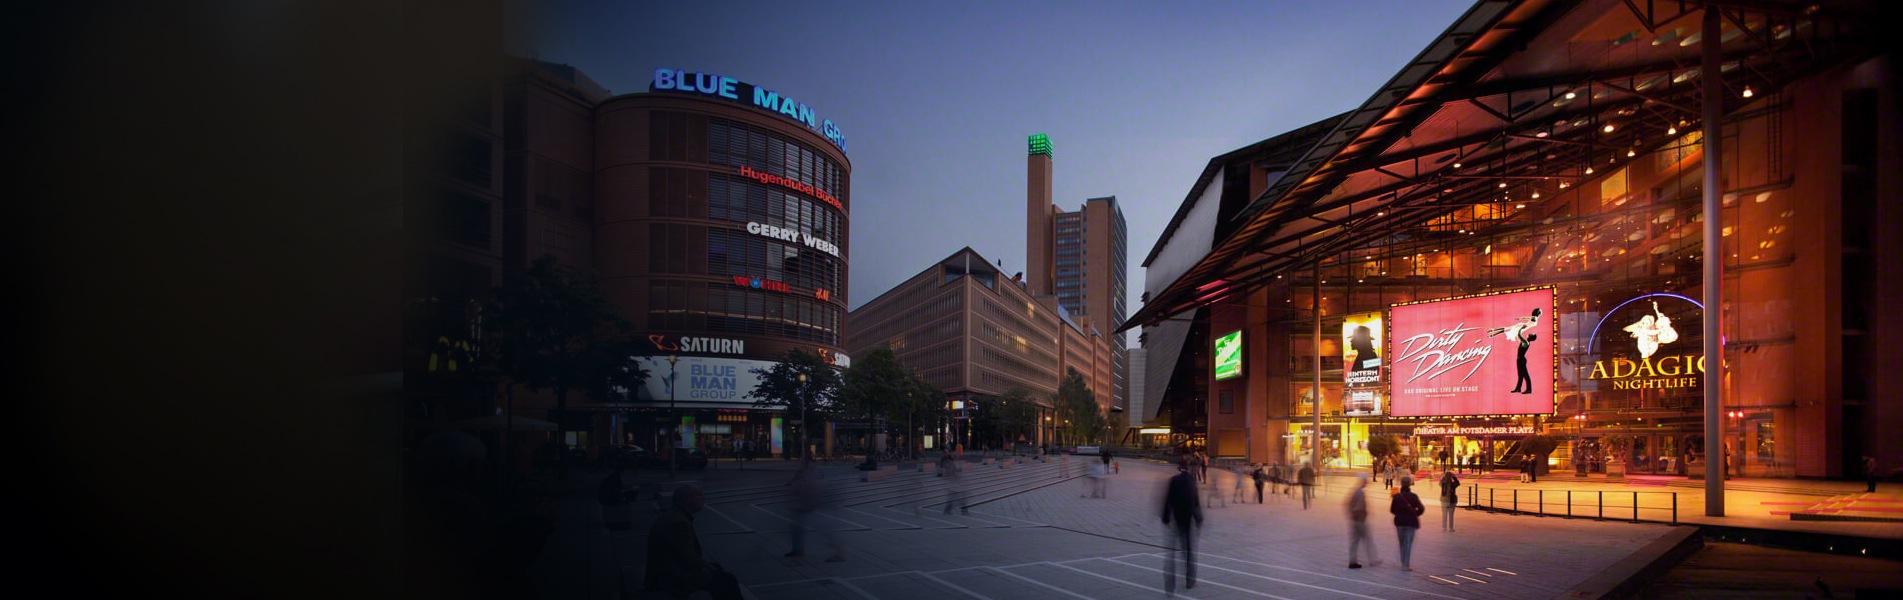 Casino Austria Wien online - 4884